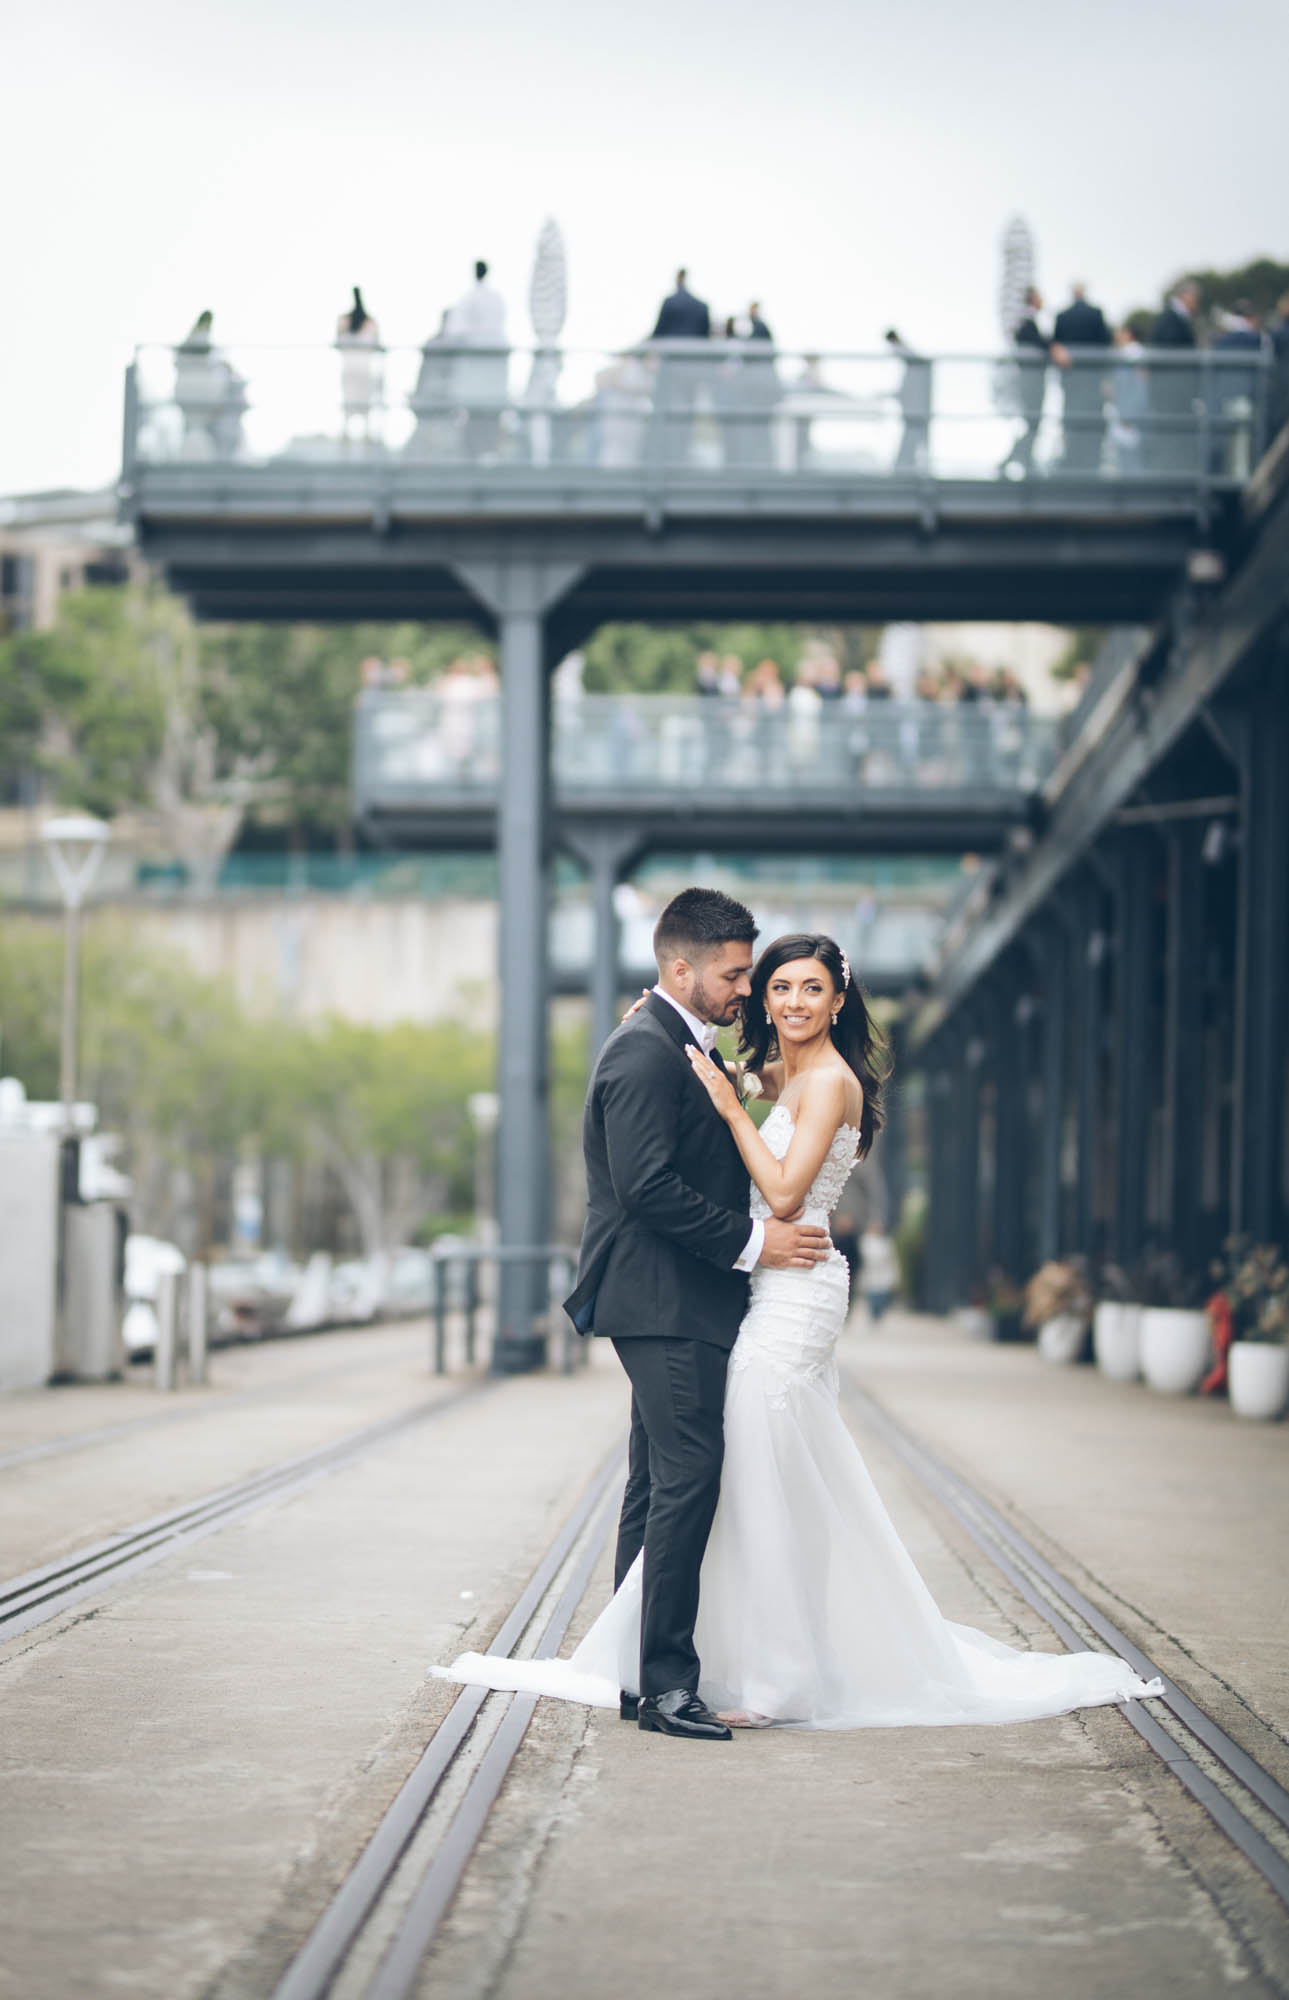 MacDougall-Photography-Sydney-Wedding-Photographers-66.jpg